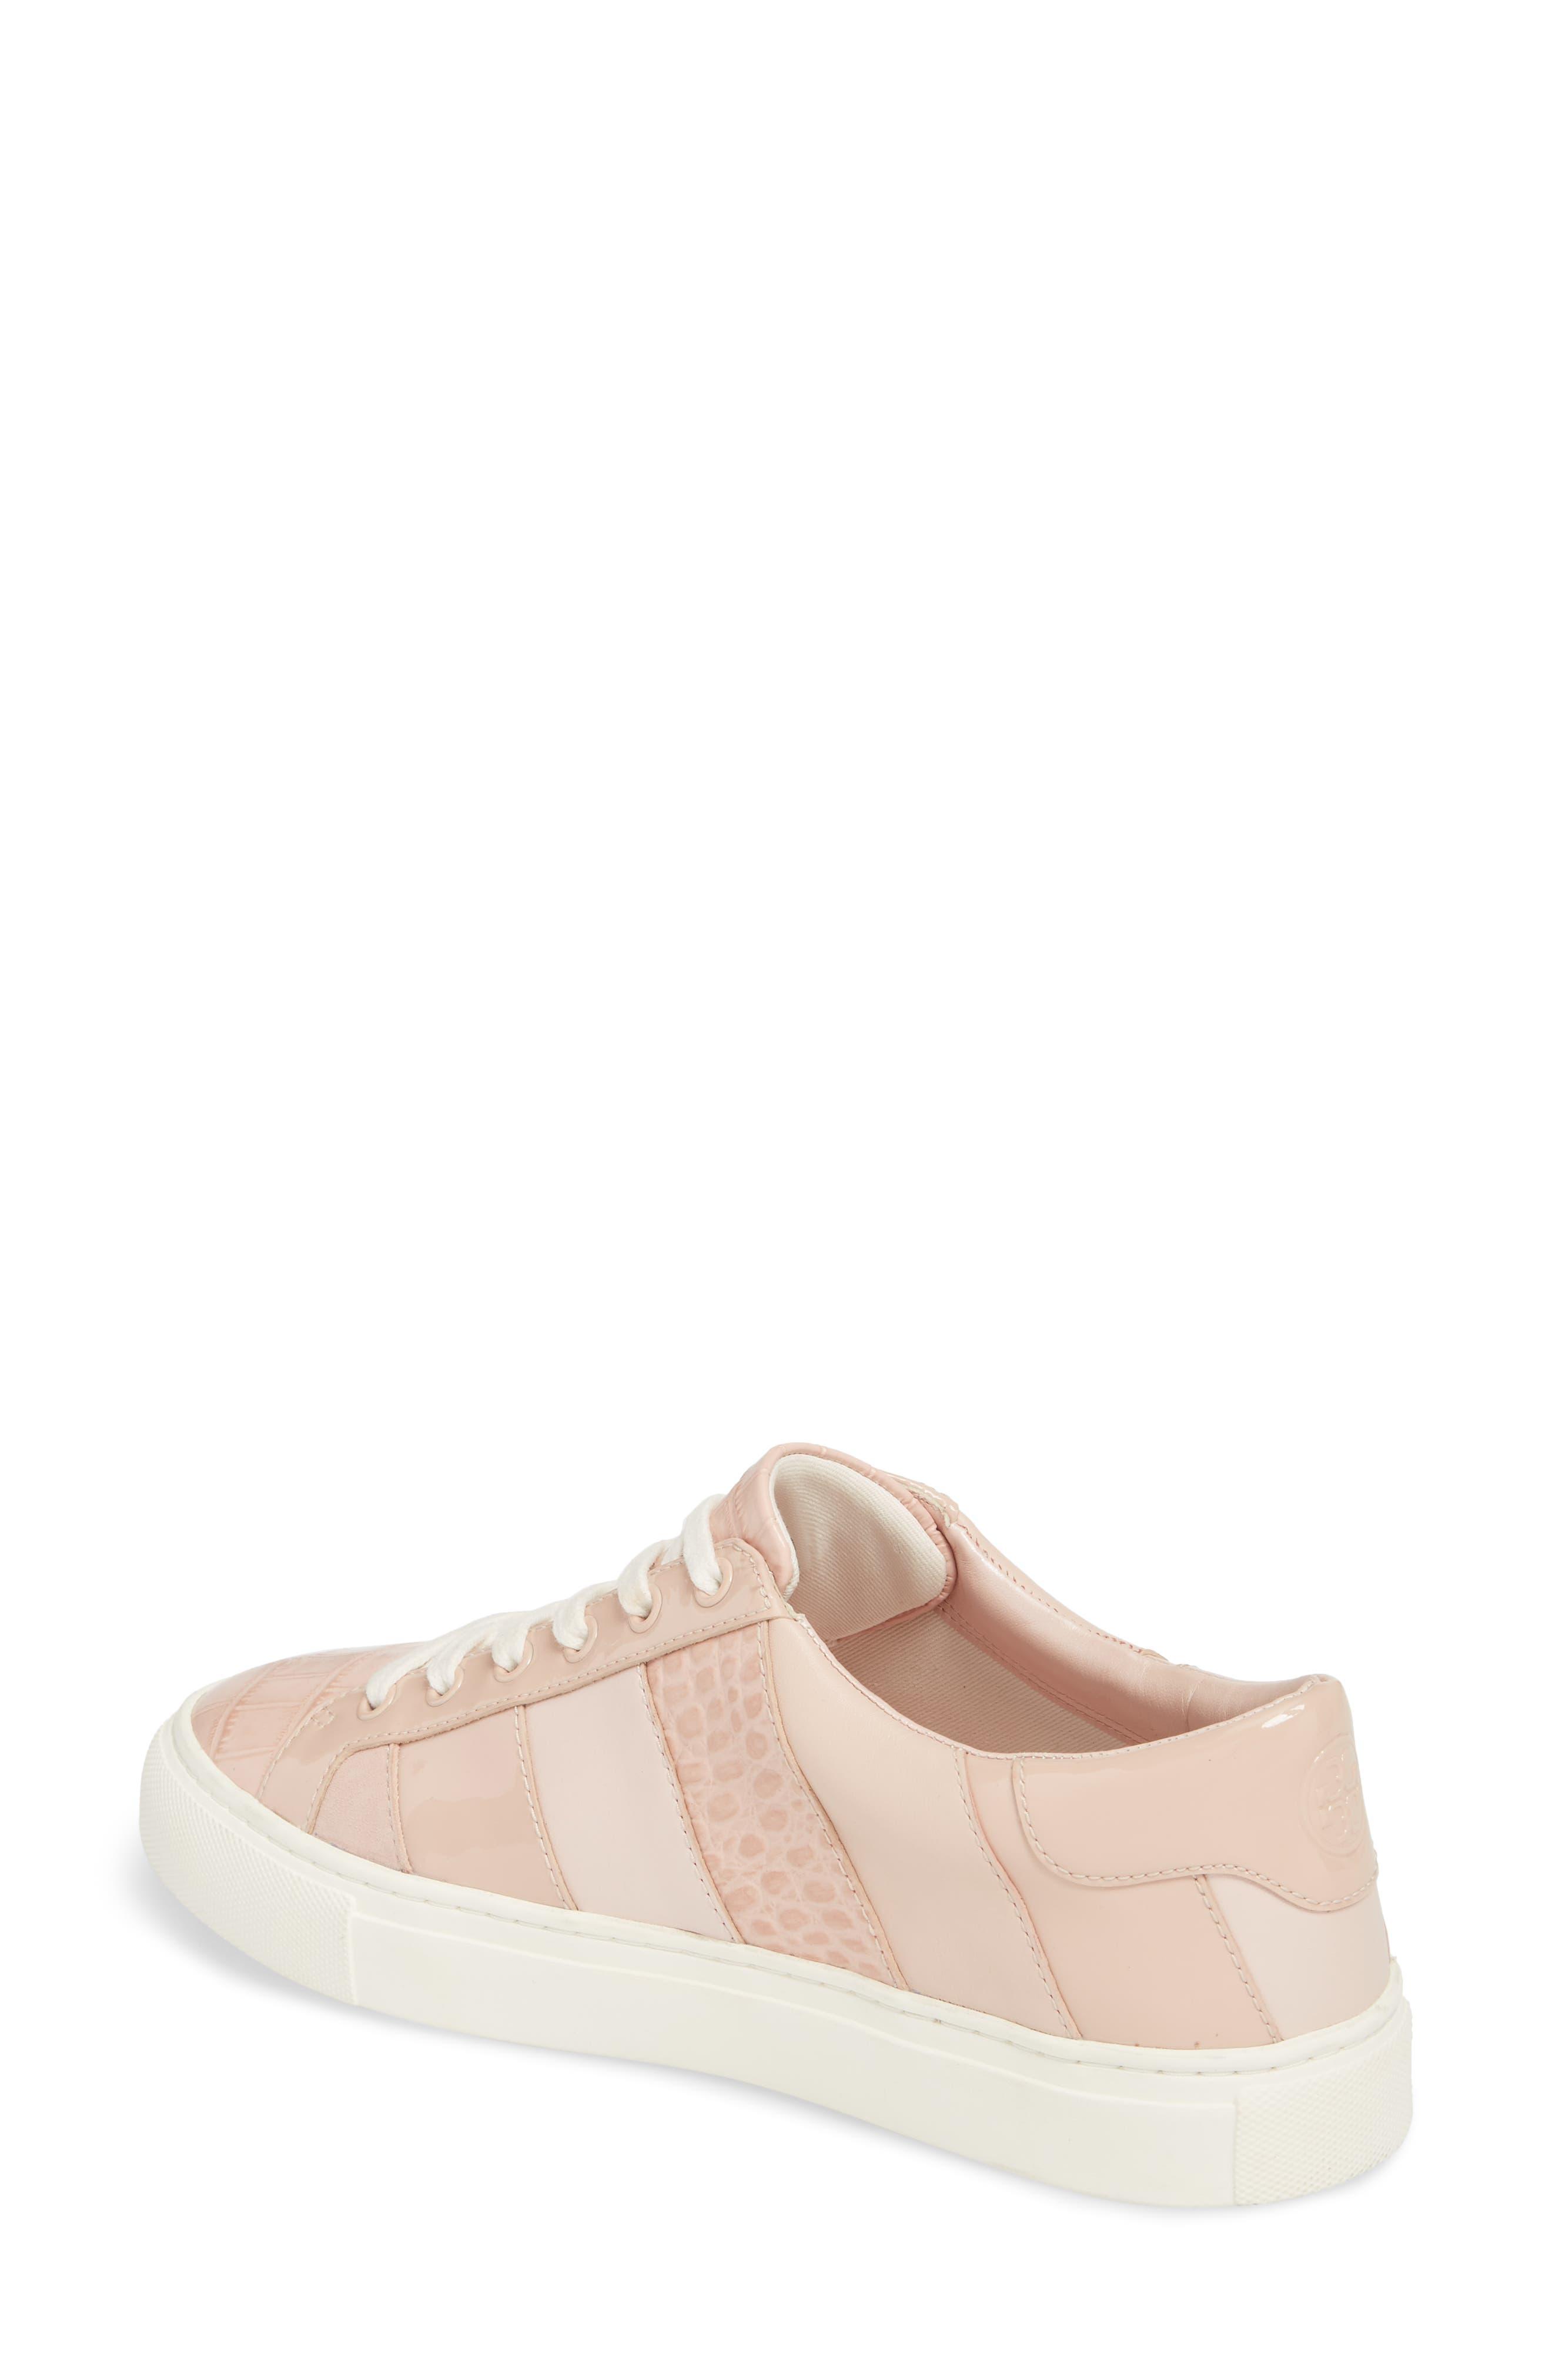 Ames Sneaker,                             Alternate thumbnail 2, color,                             Sea Shell Pink/ Sea Shell Pink